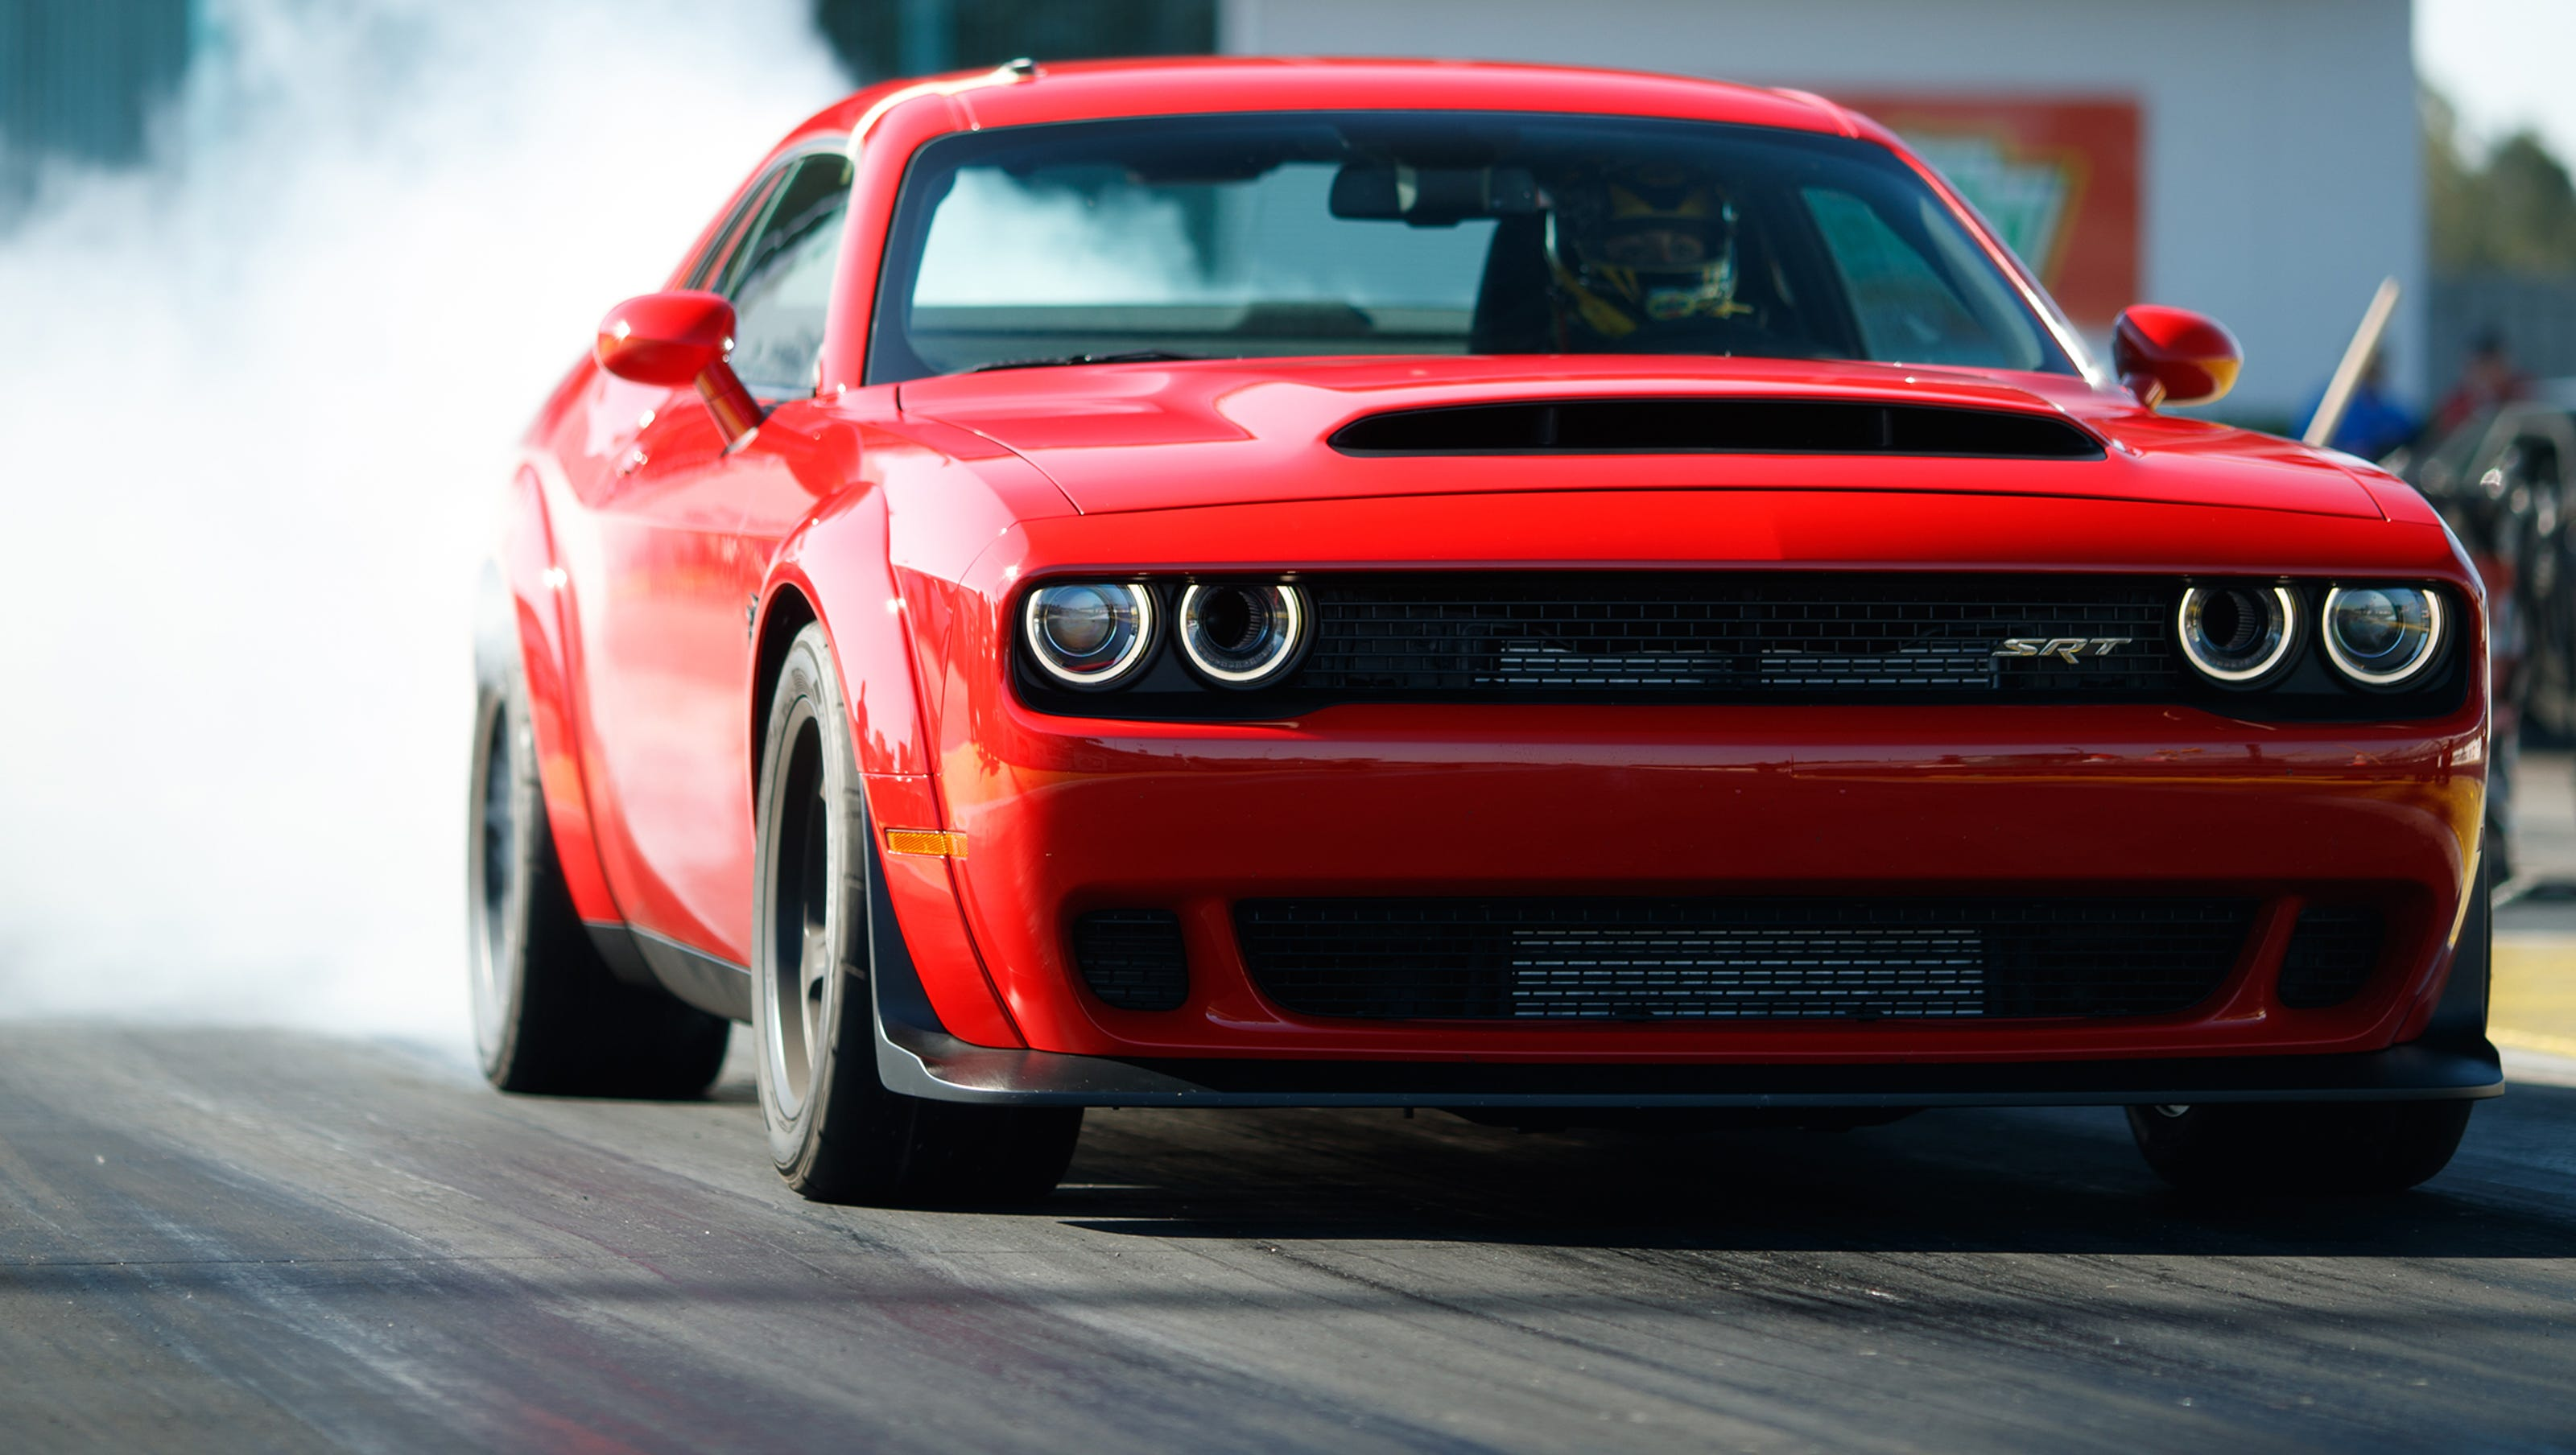 Last Dodge Demon The Super Muscle Car Rolls Off The Line